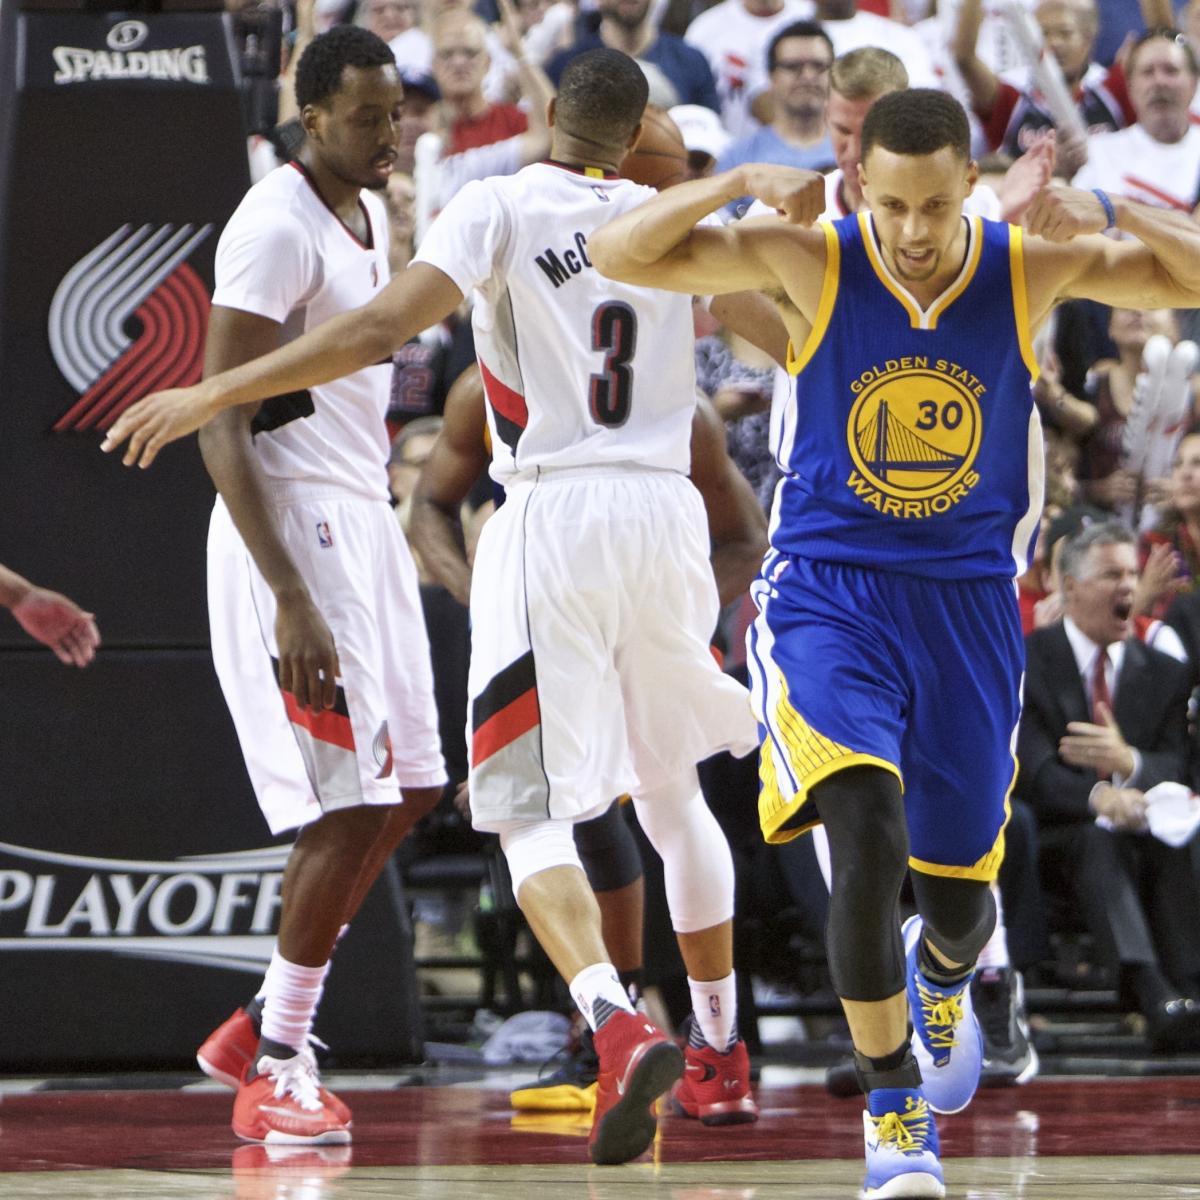 Warriors Vs Trail Blazers: Game 4 Video Highlights, Recap